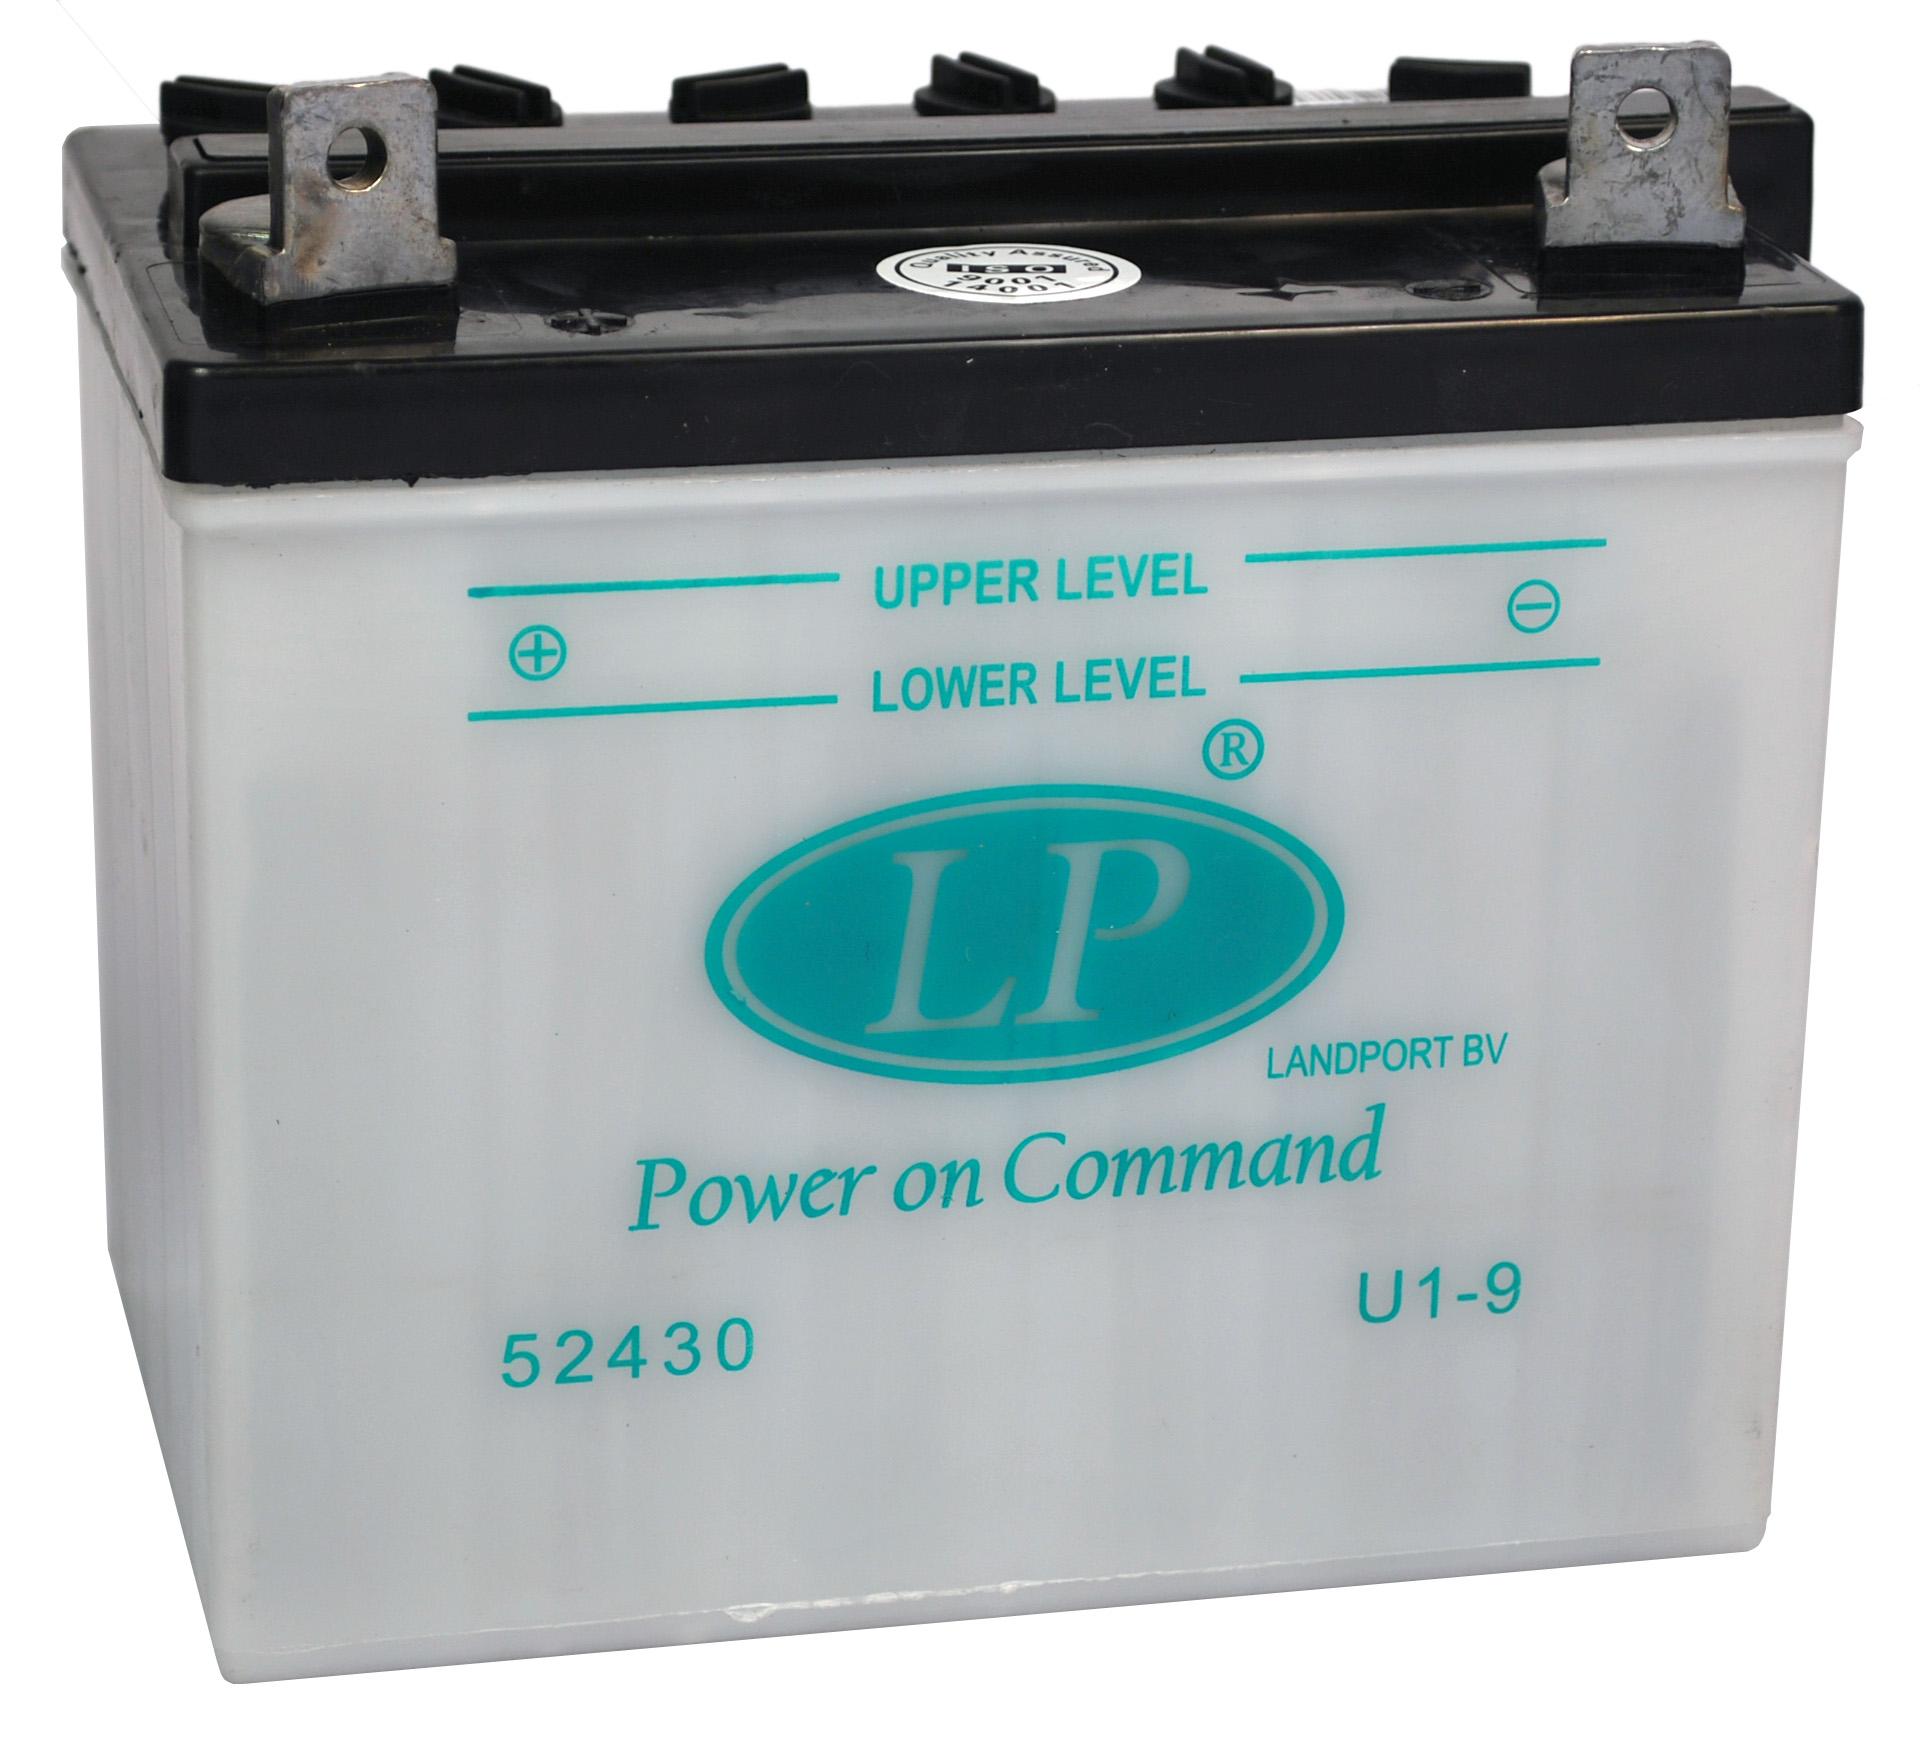 U1-9 motor accu zonder zuurpakket